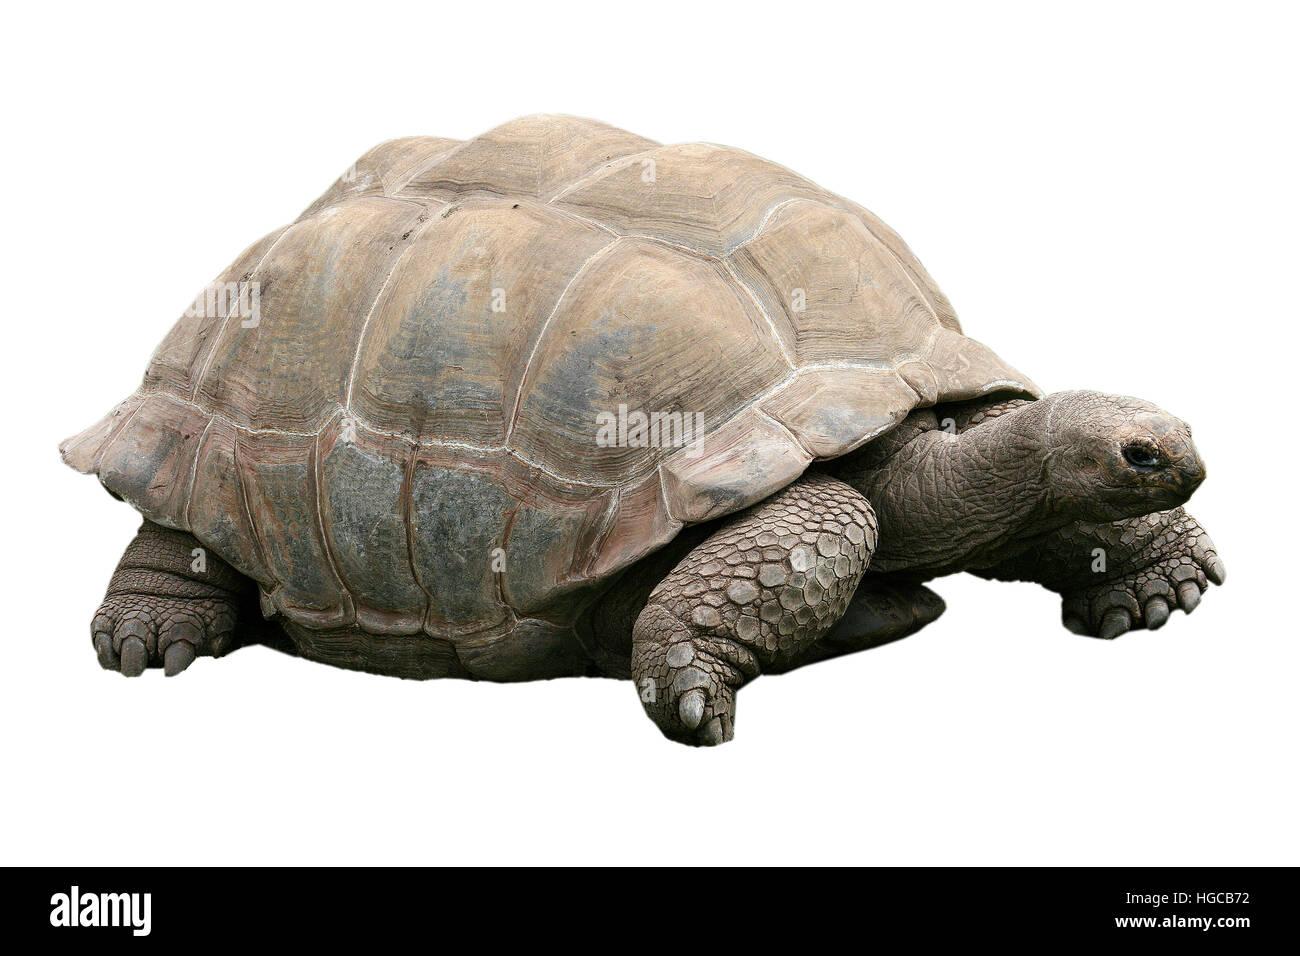 Geochelone gigantea, Aldabra giant tortoise - Stock Image